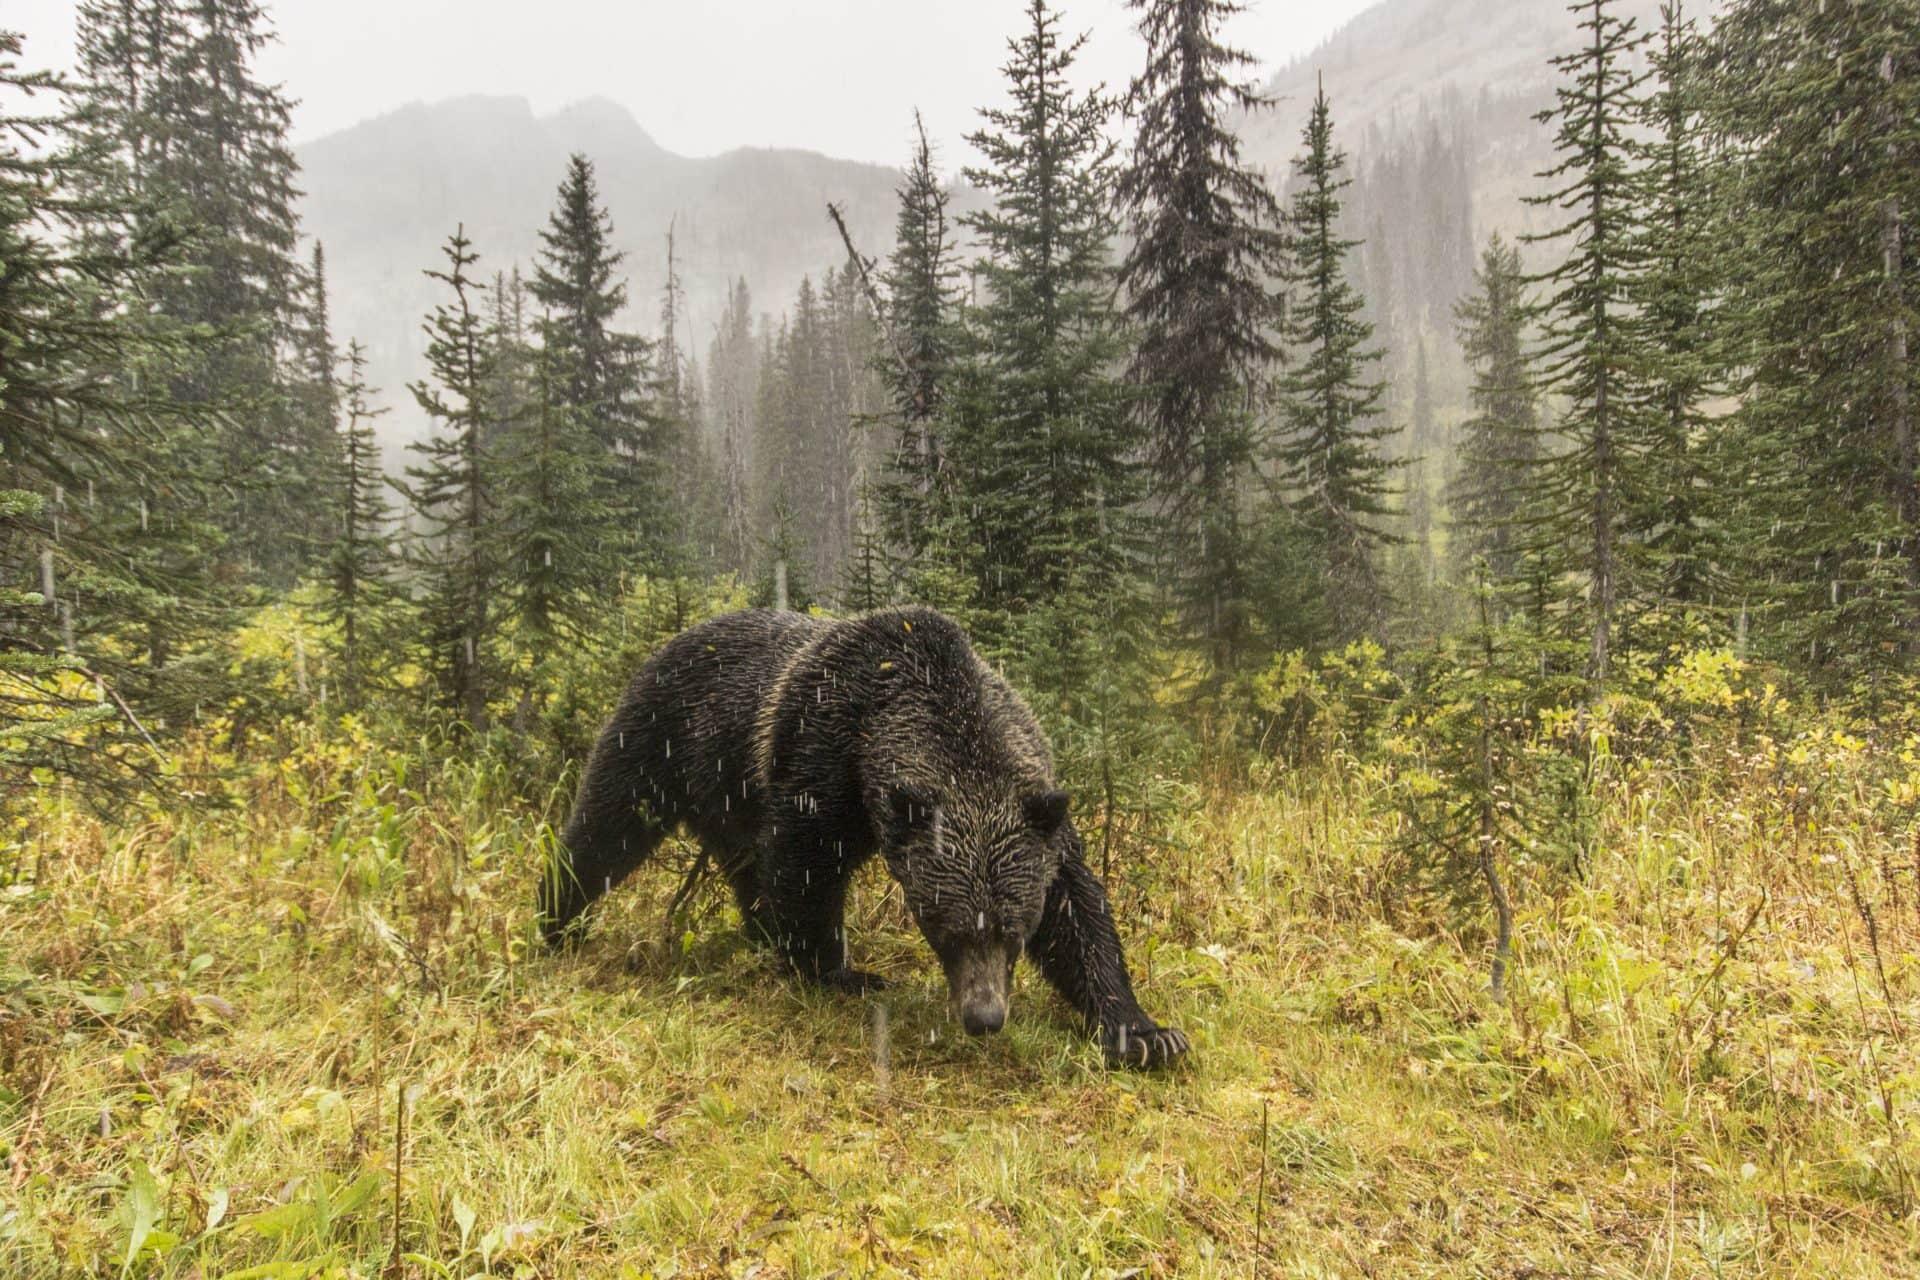 Grizzly bear David Moskowitz